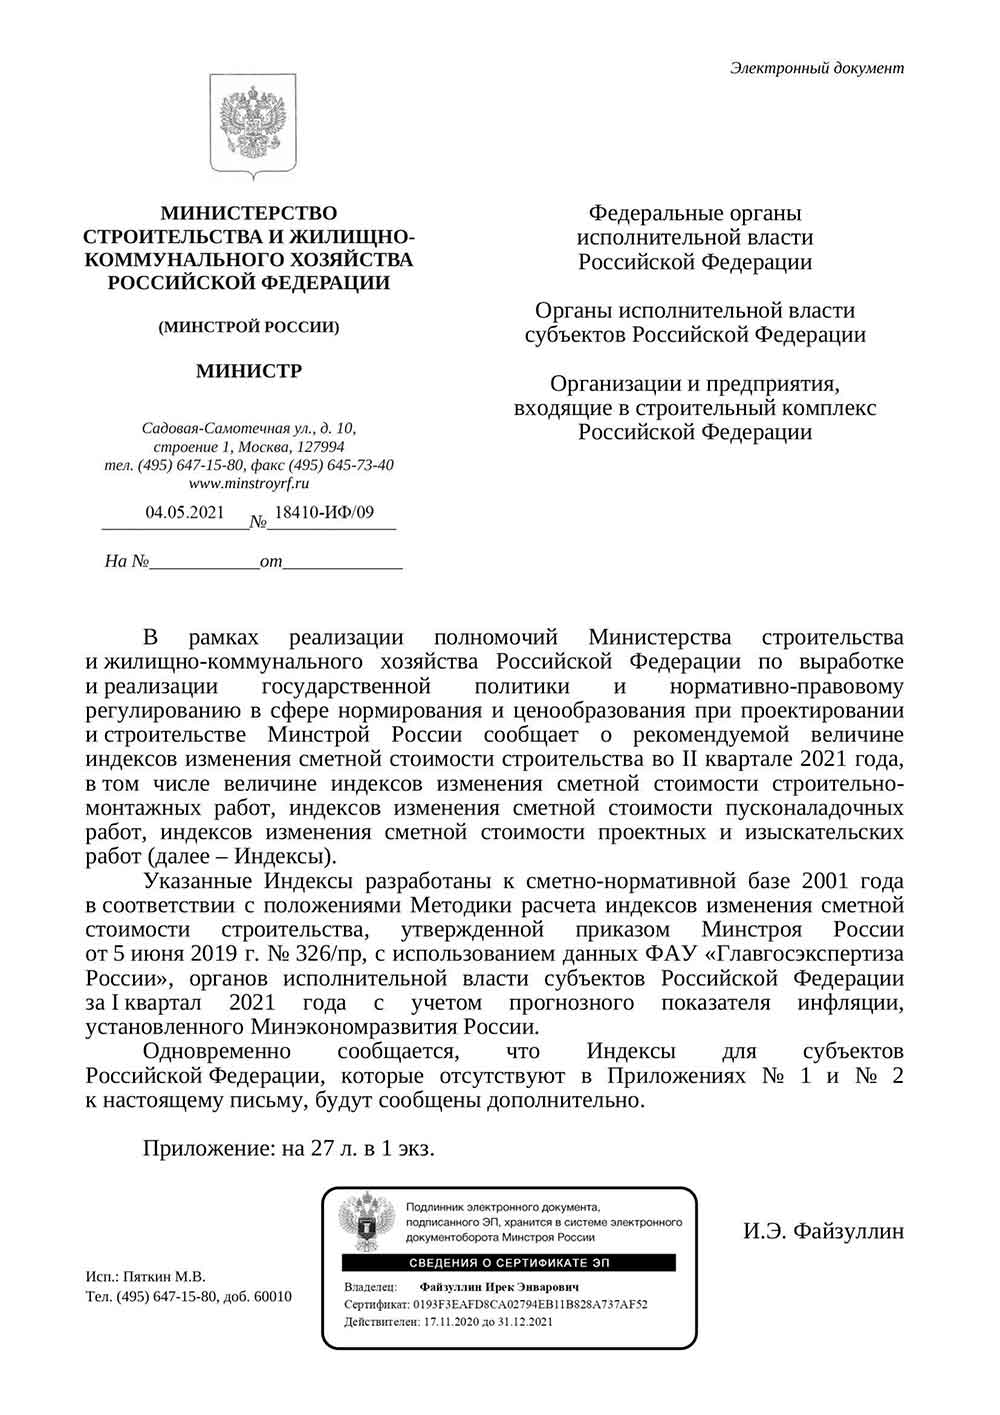 Письмо Минстроя РФ №18410-ИФ/09 от 04.05.2021 г.